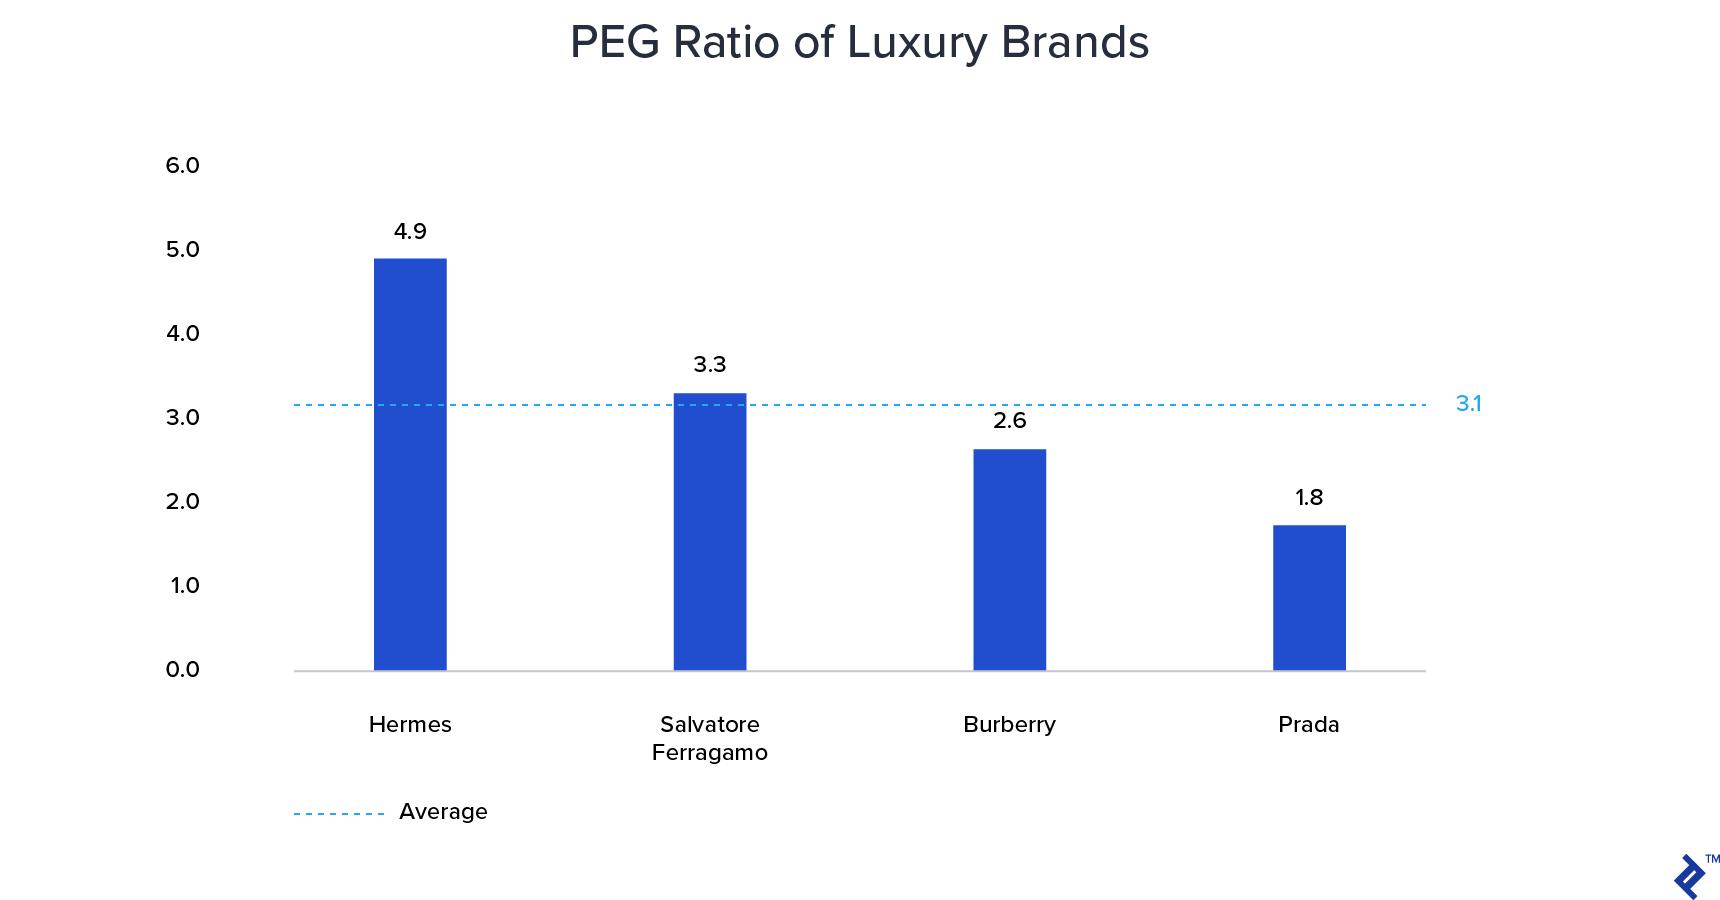 PEG Ratio of luxury brands